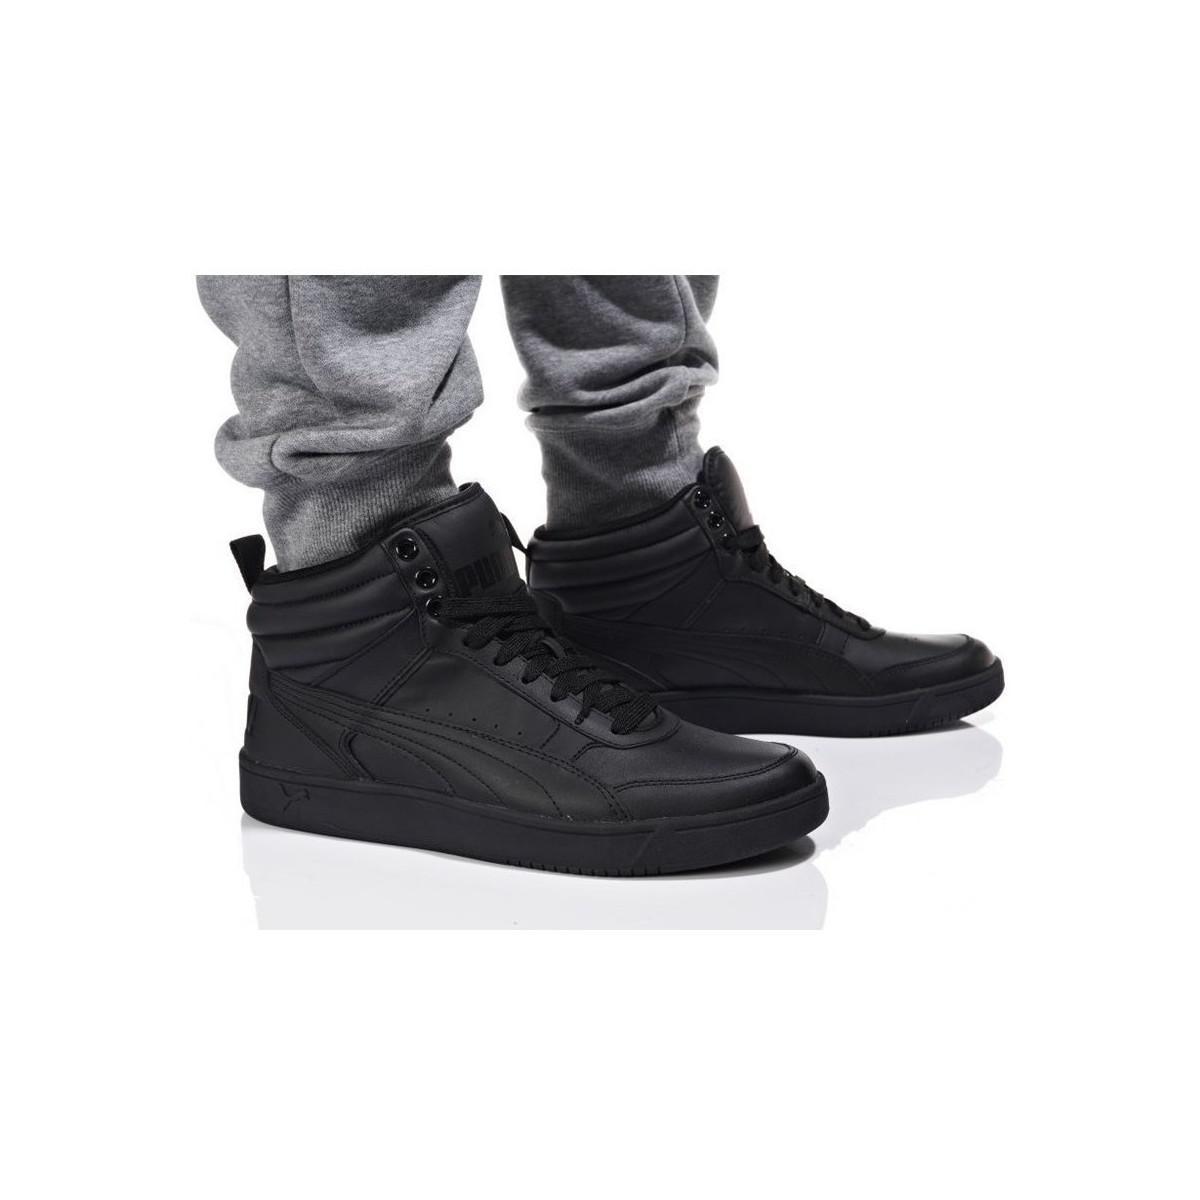 In Puma Black Top Rebound Shoes V2 Men's Street high L Trainers BqzFxvBrw